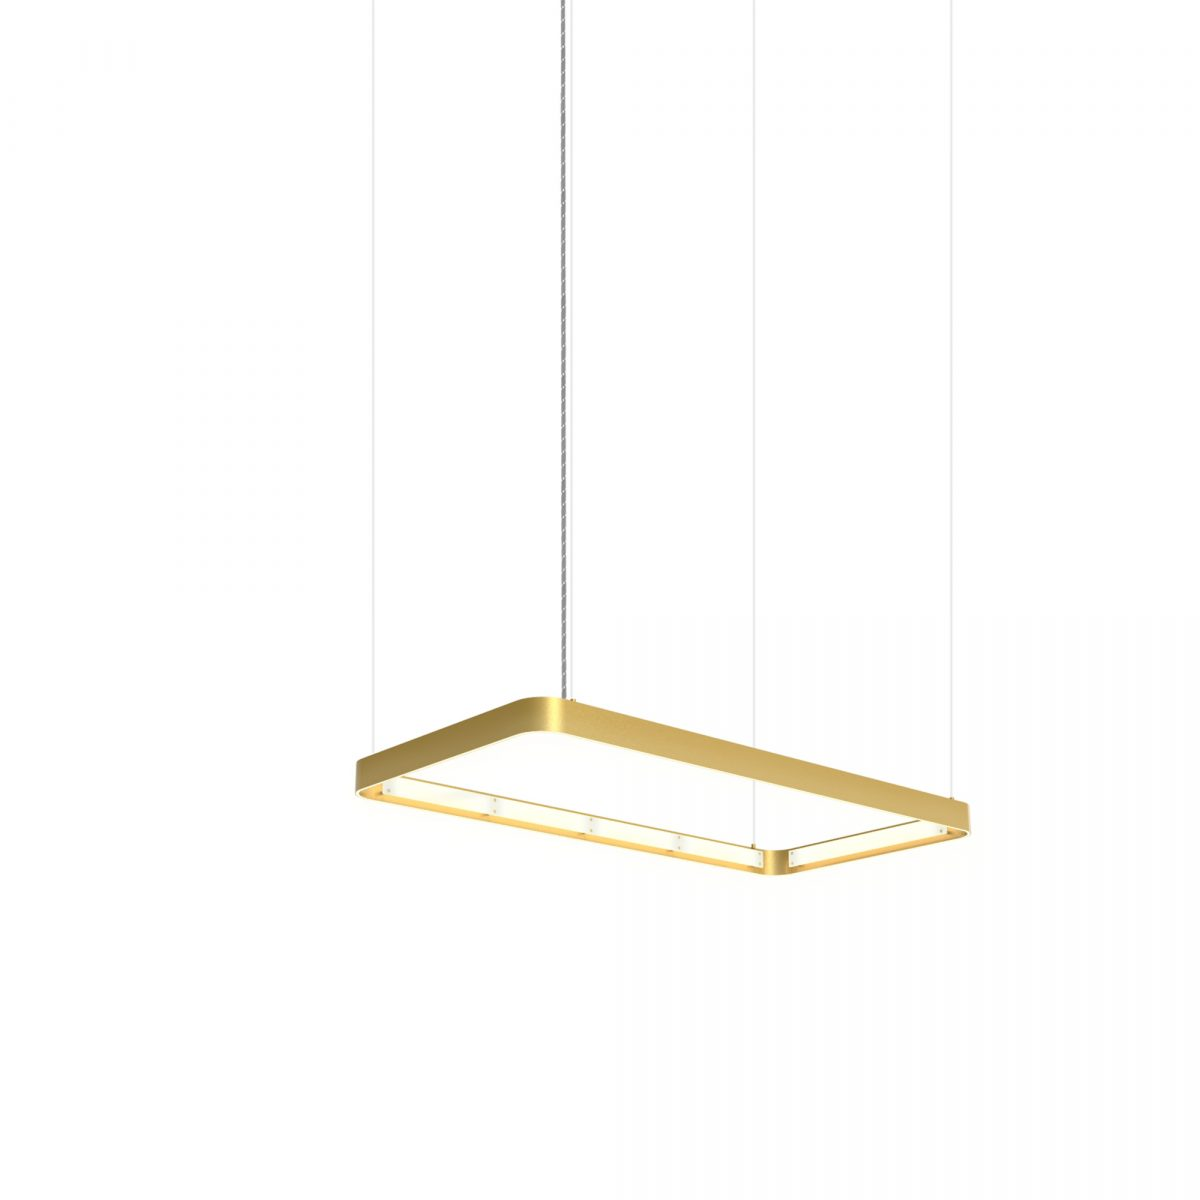 JSPR Eden Deco 50×100 Gold Rectangle